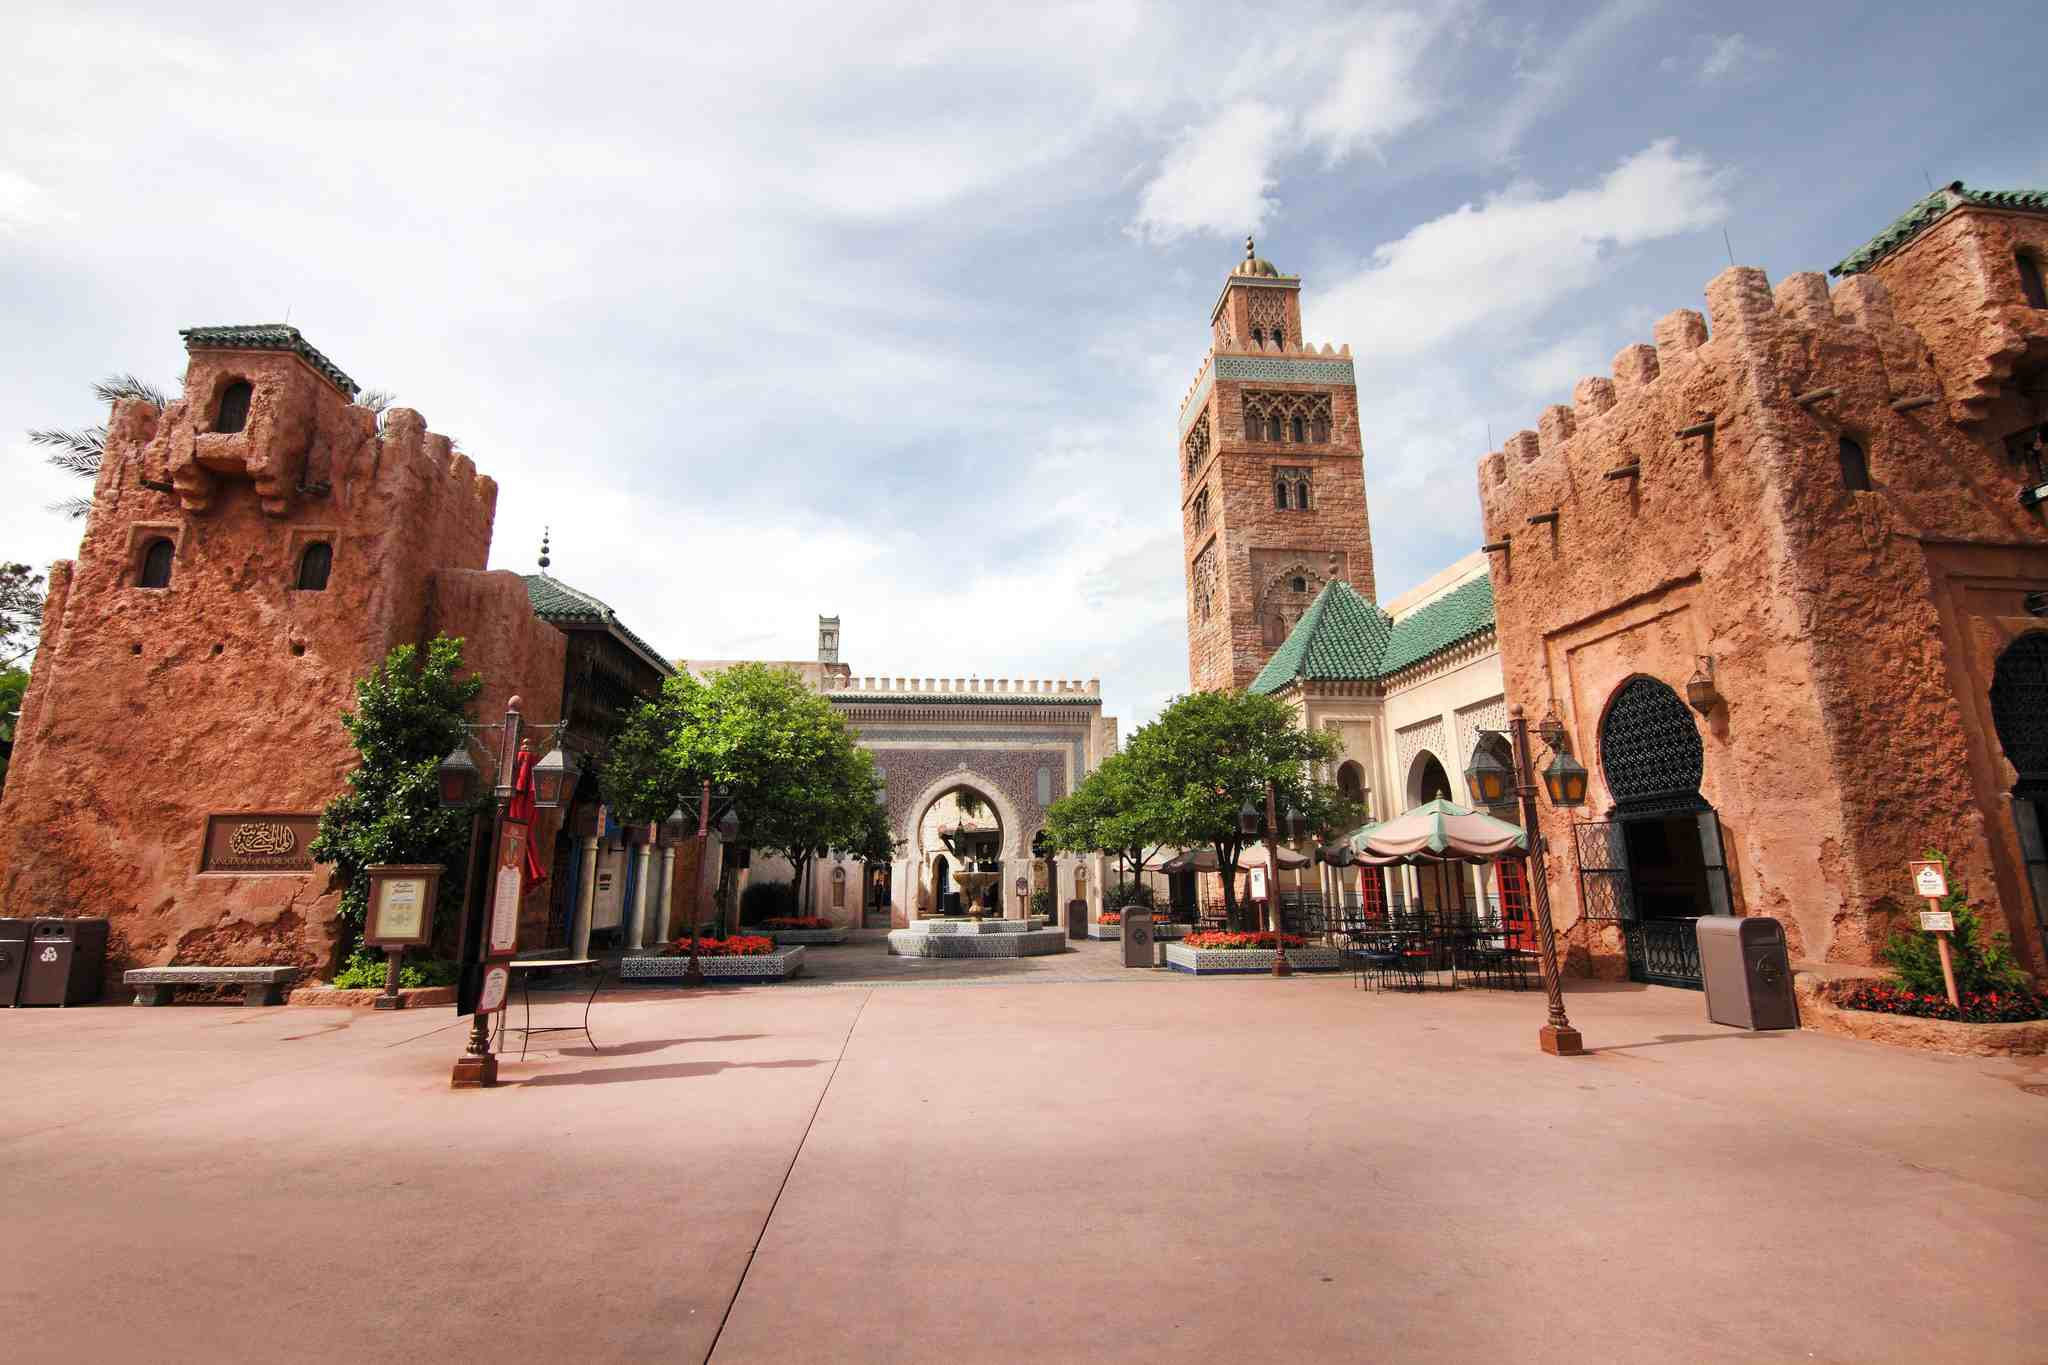 Morocco Pavilion at World Showcase, Walt Disney World